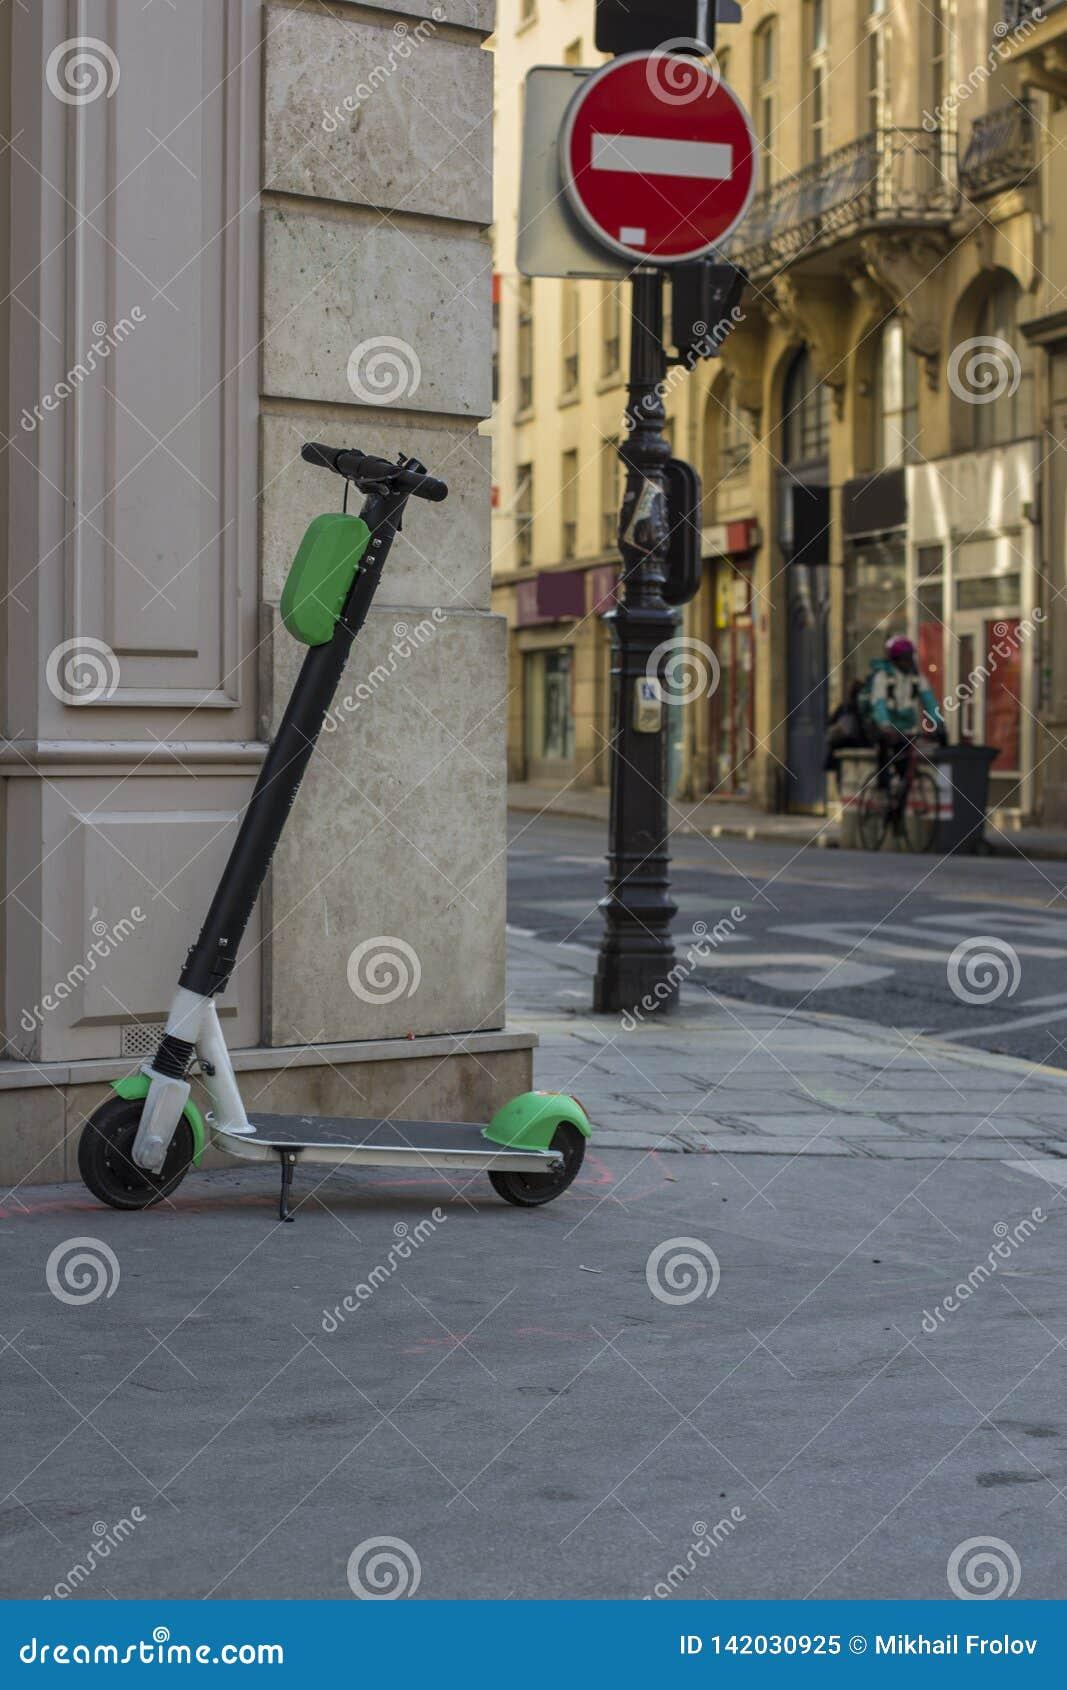 Scooter kicksharing on the sidewalk. Paris city